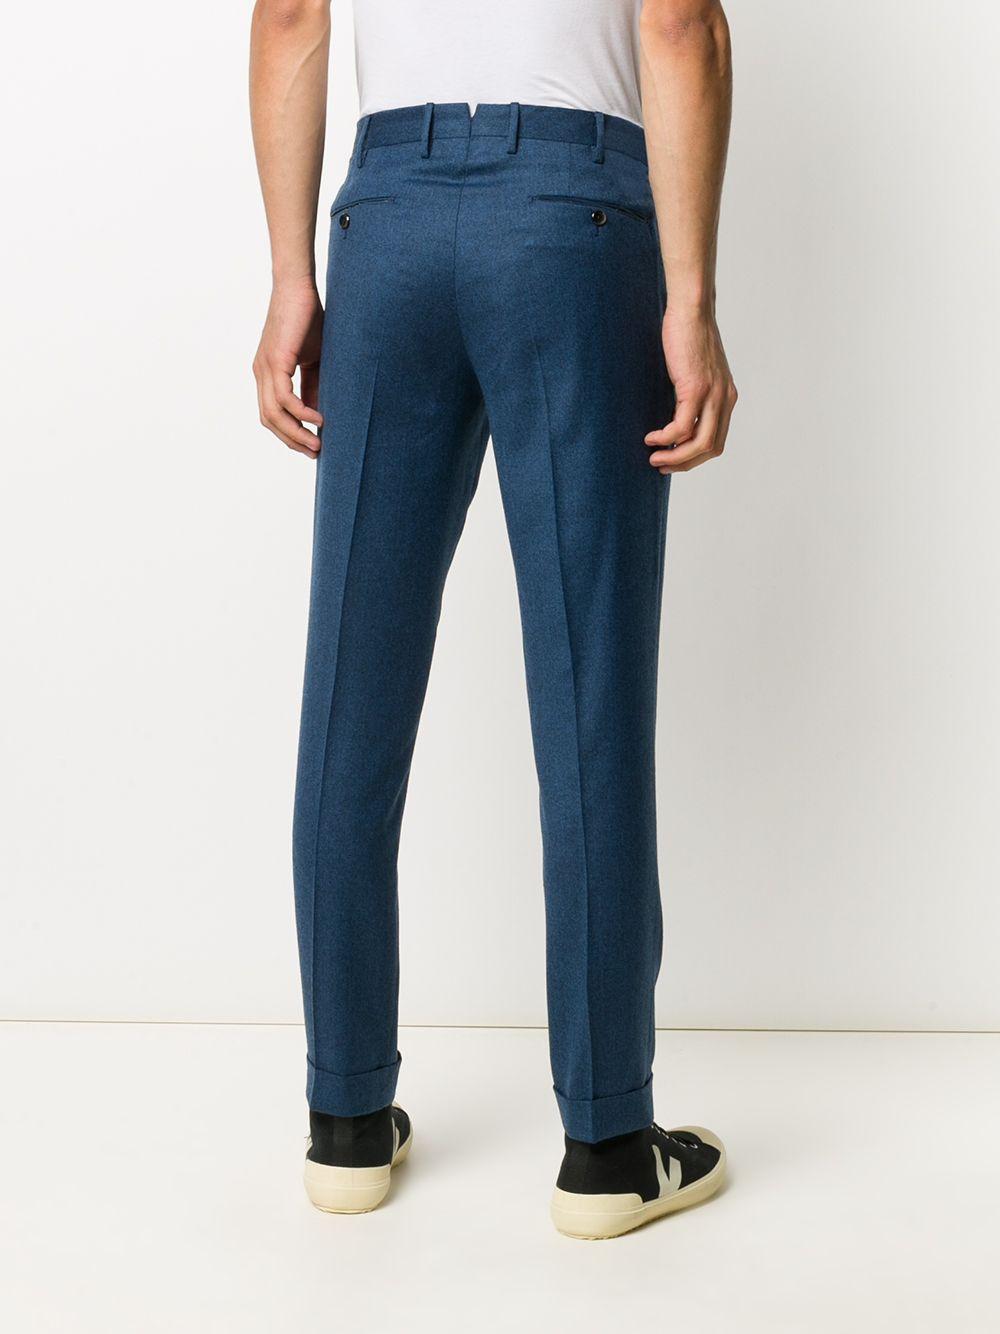 Pantalone dritto blu avion in lana con doppia pence PT01 | Pantaloni | COHS22ZS0CL2-RE840345